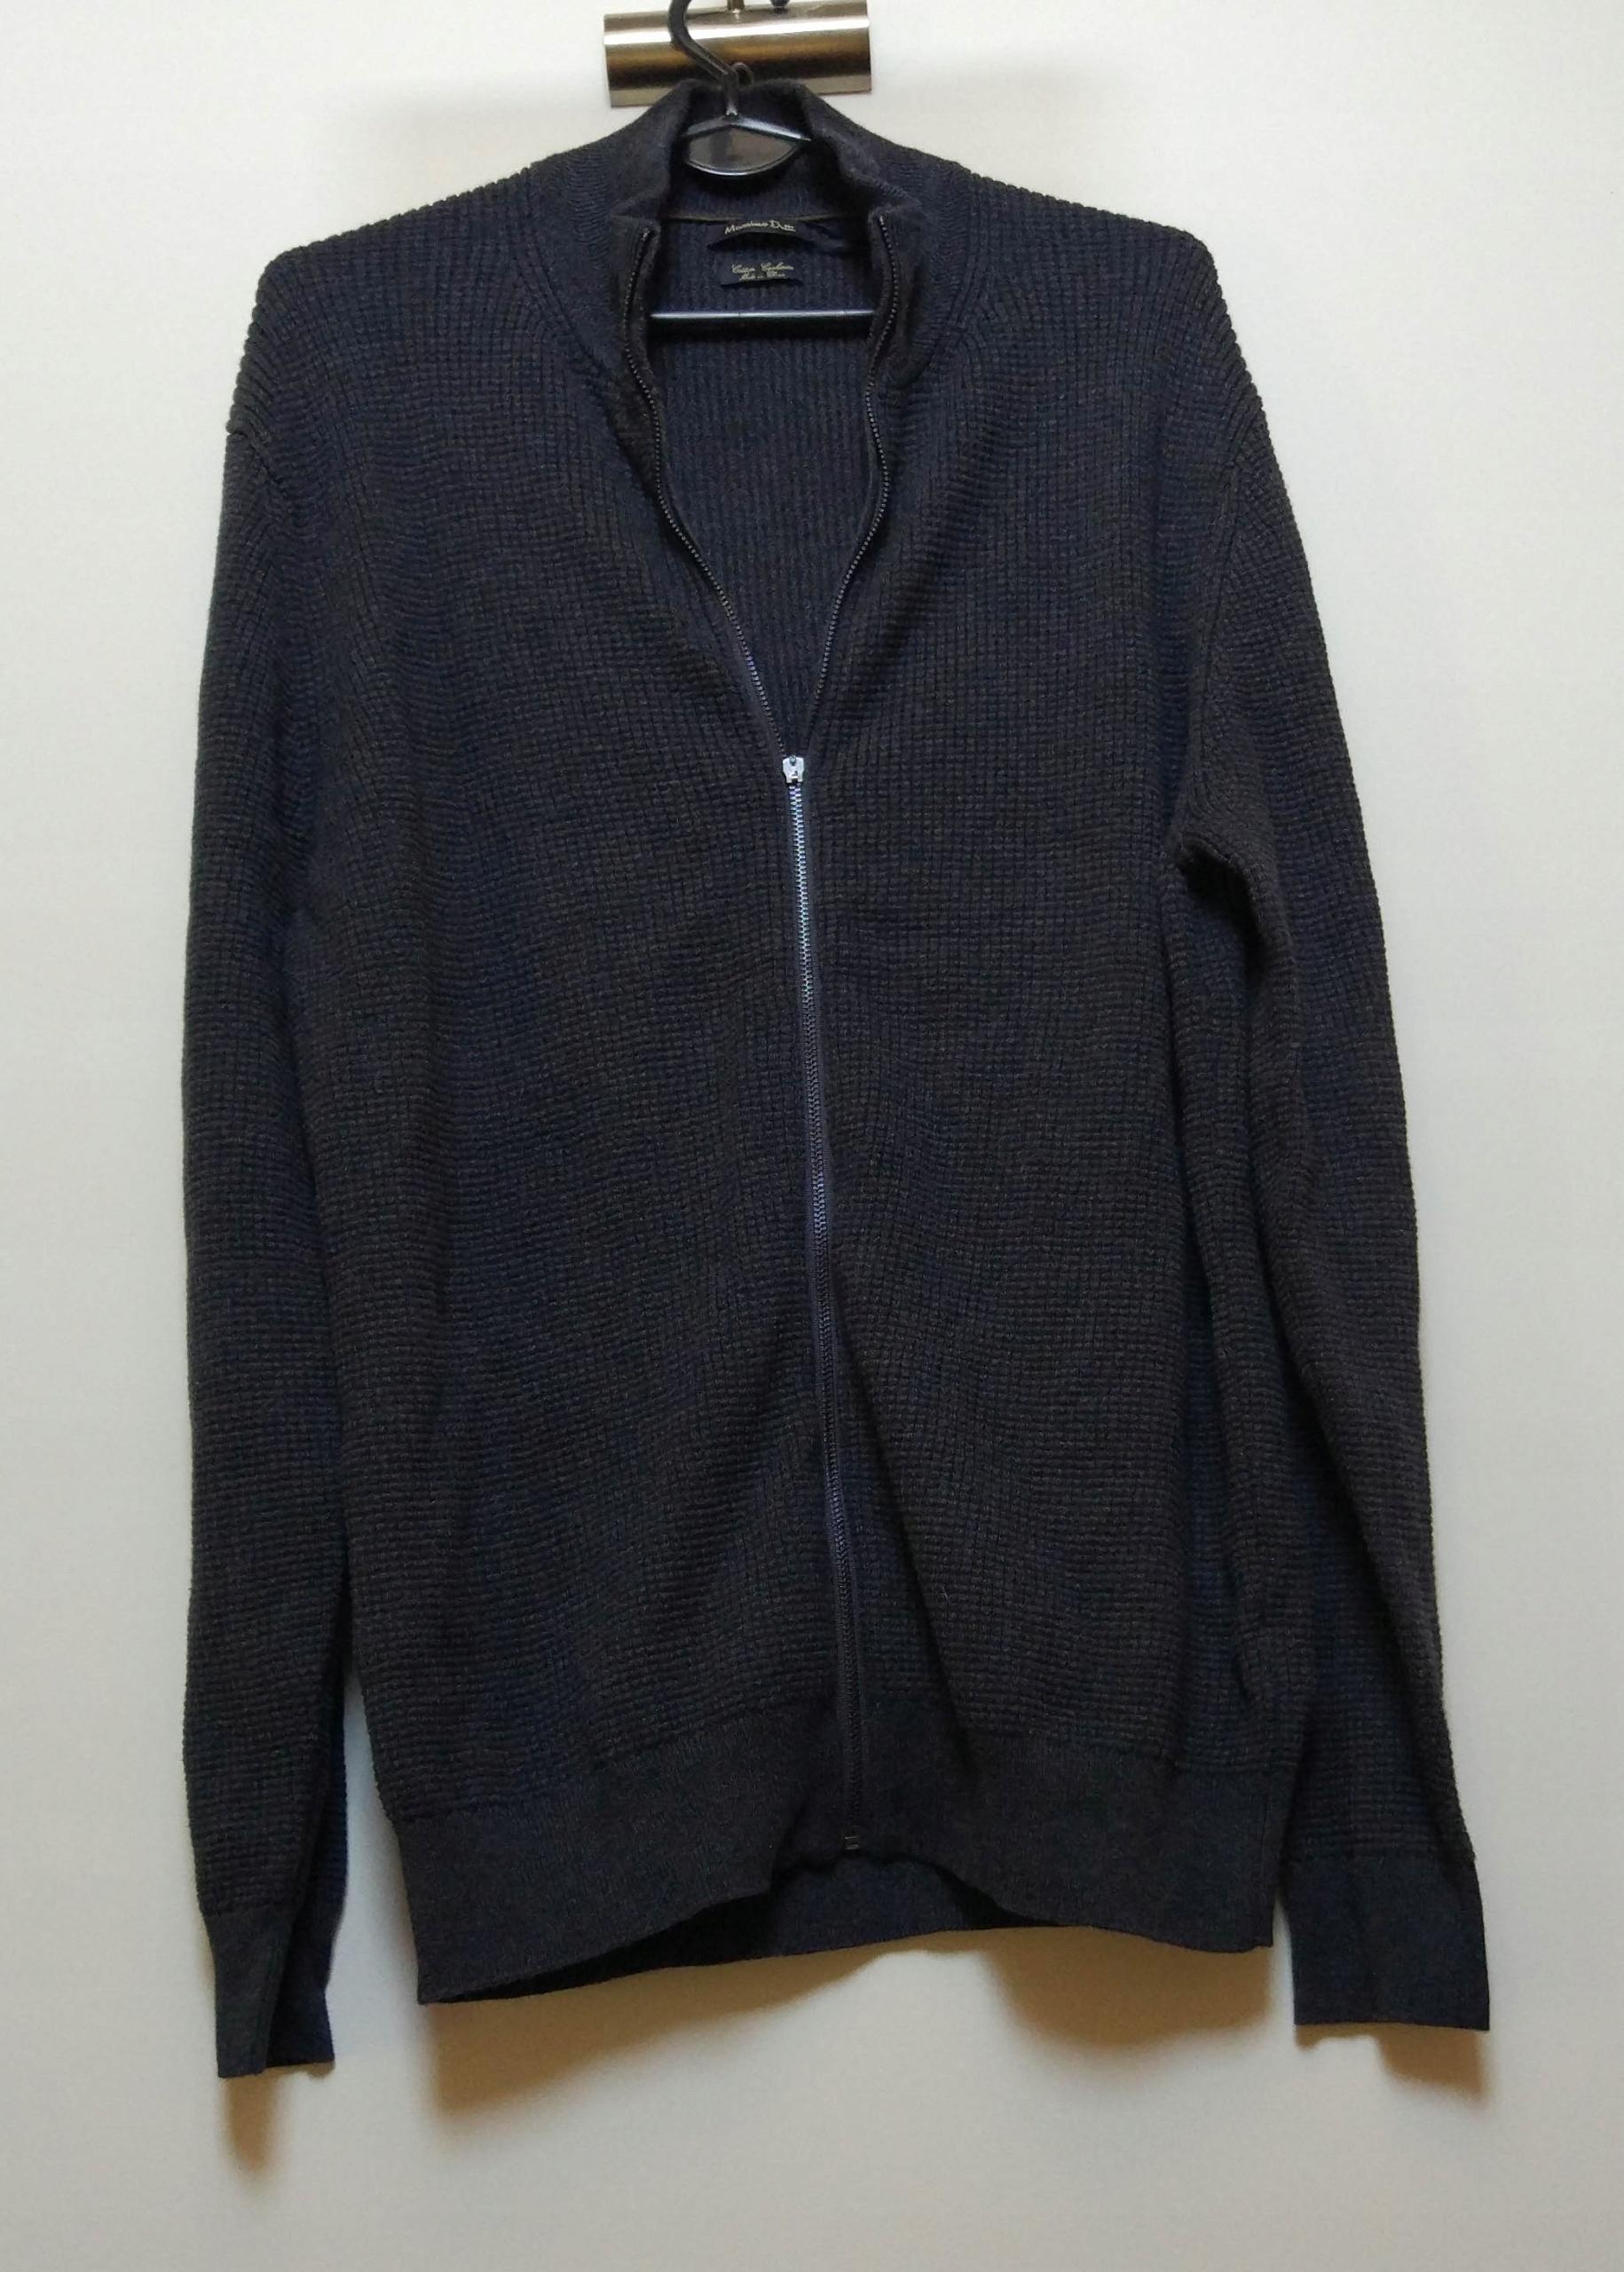 MASSIMO DUTTI sweter na zamek bluza kaszmir XL